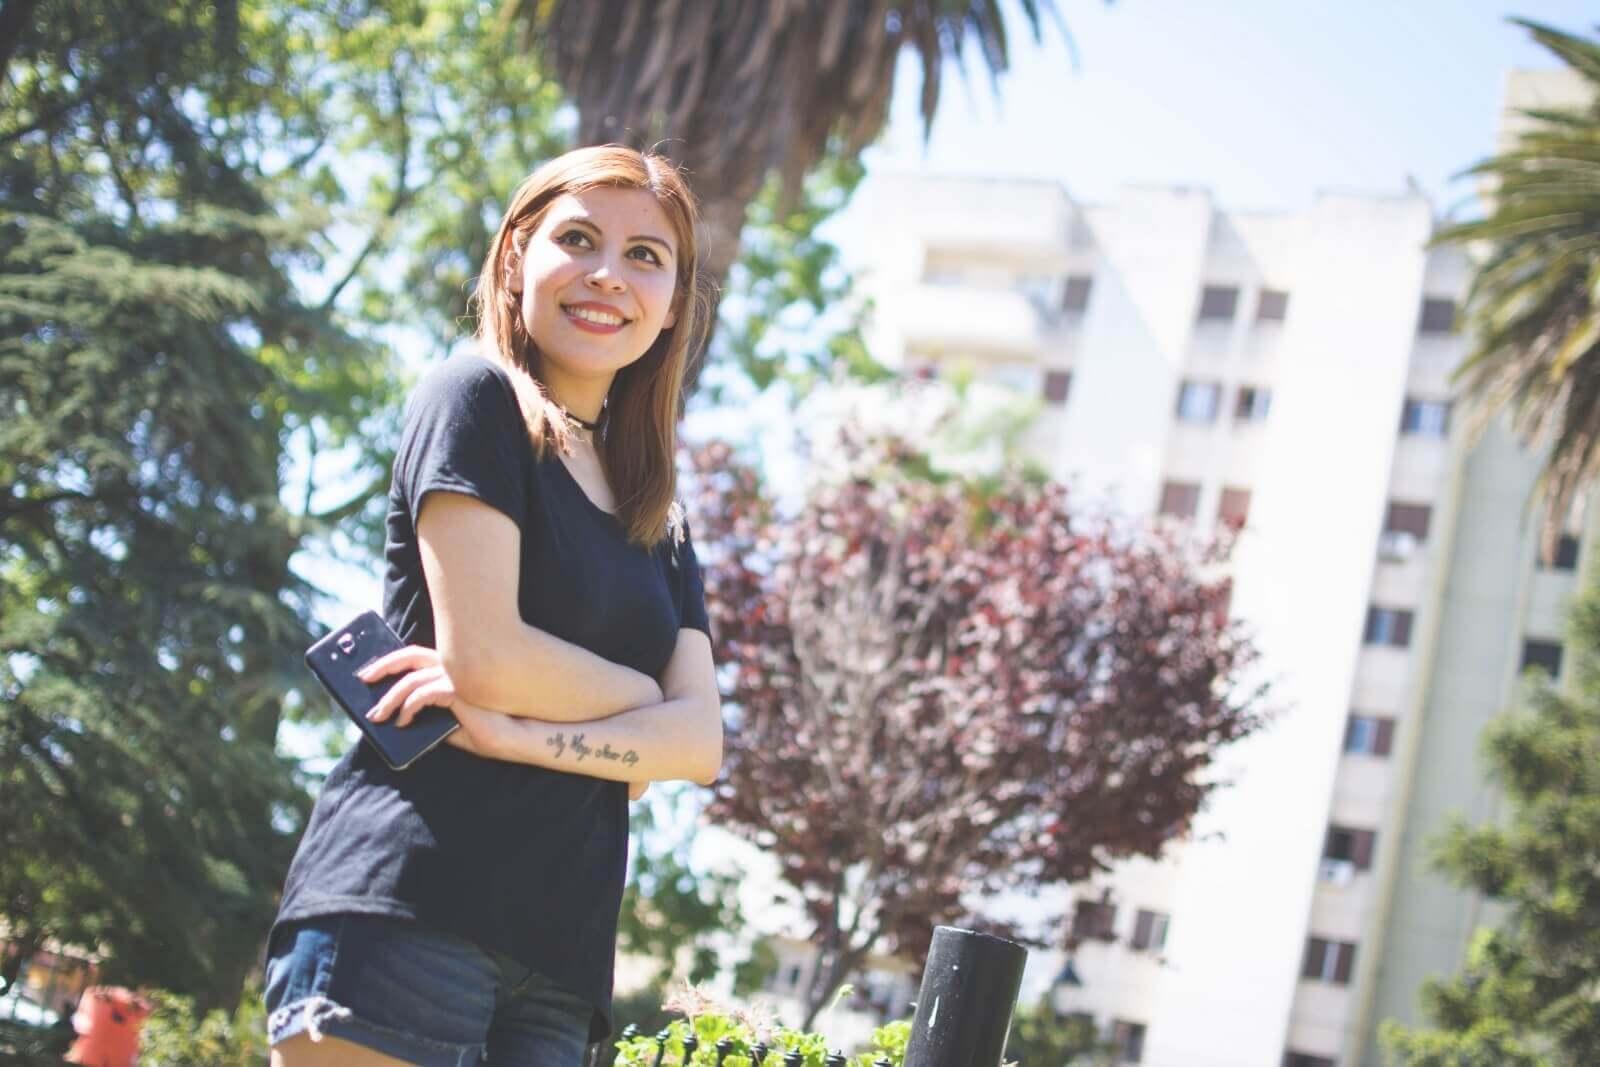 black-tshirt-jeans-california-girl-outfit-ankle-booties-summer-in-black-deborah-ferrero-style-by-deb03